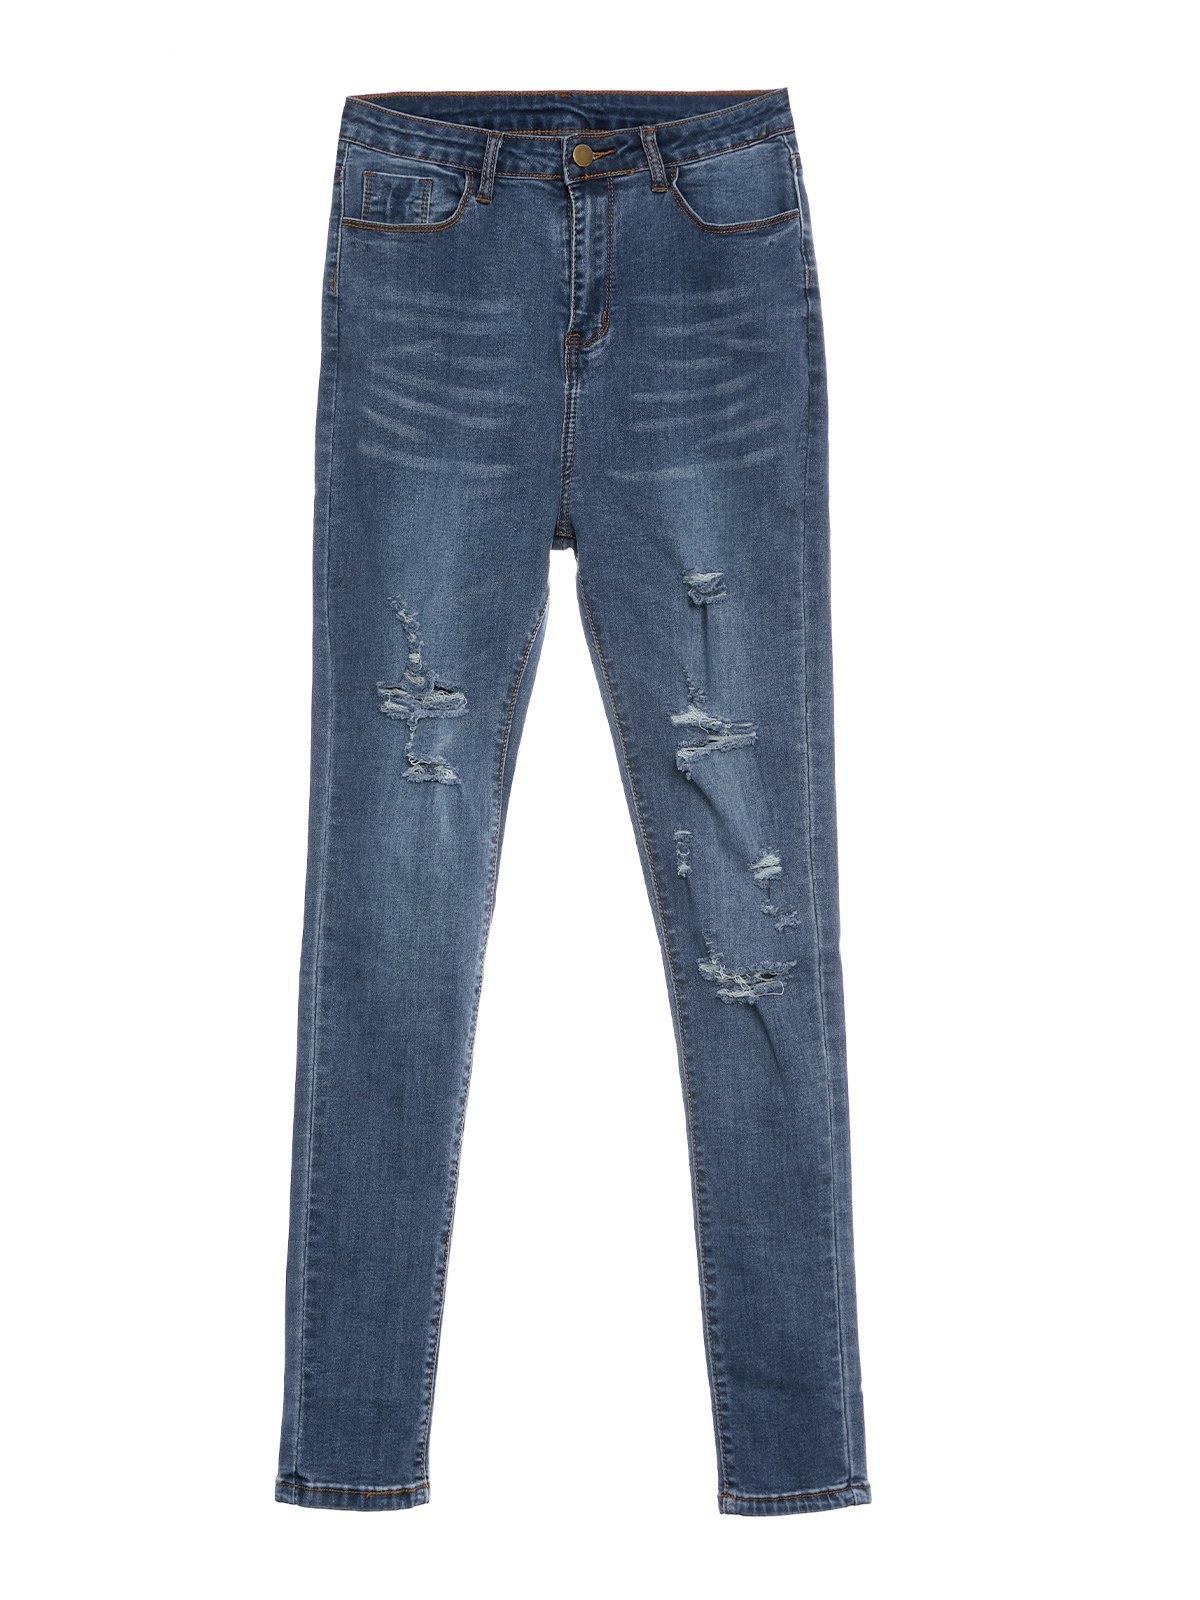 Stretch Skinny Ripped Jeans -